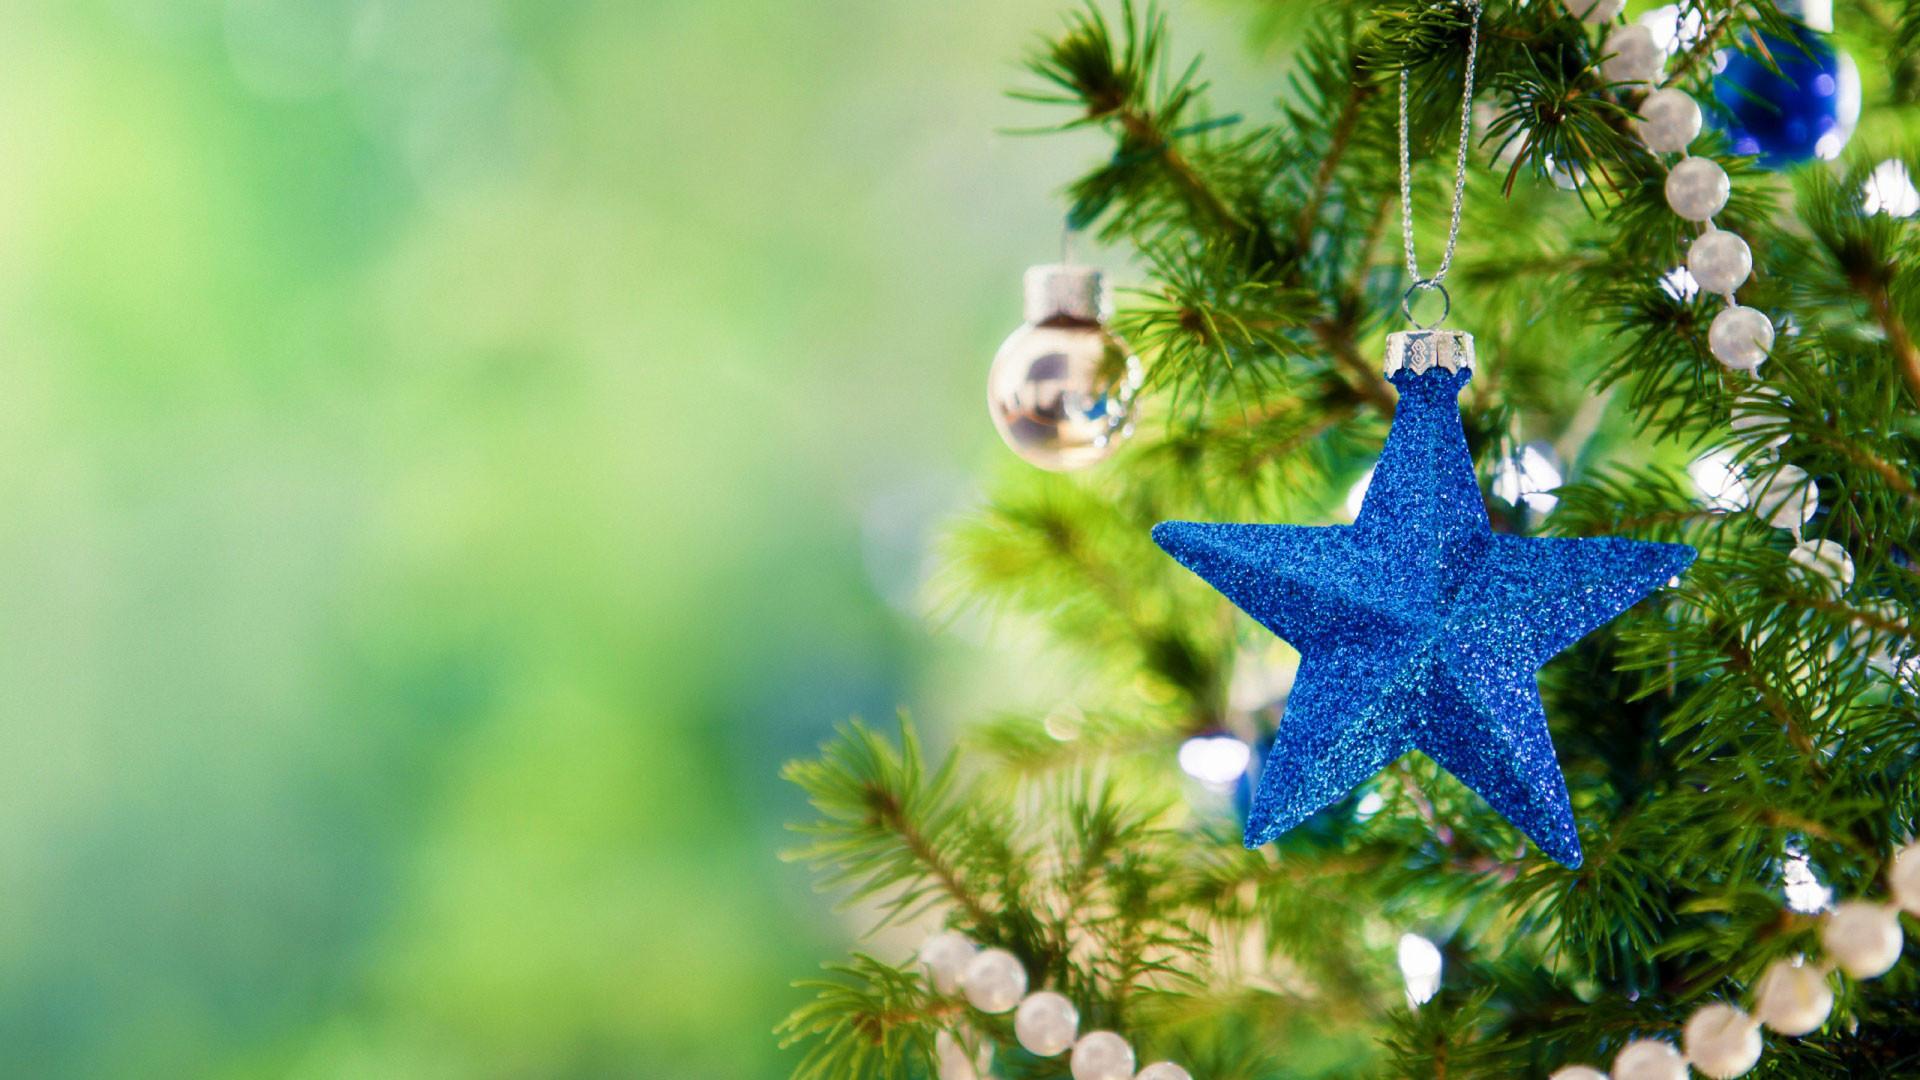 hd pics photos christmas christmas tree star desktop background wallpaper